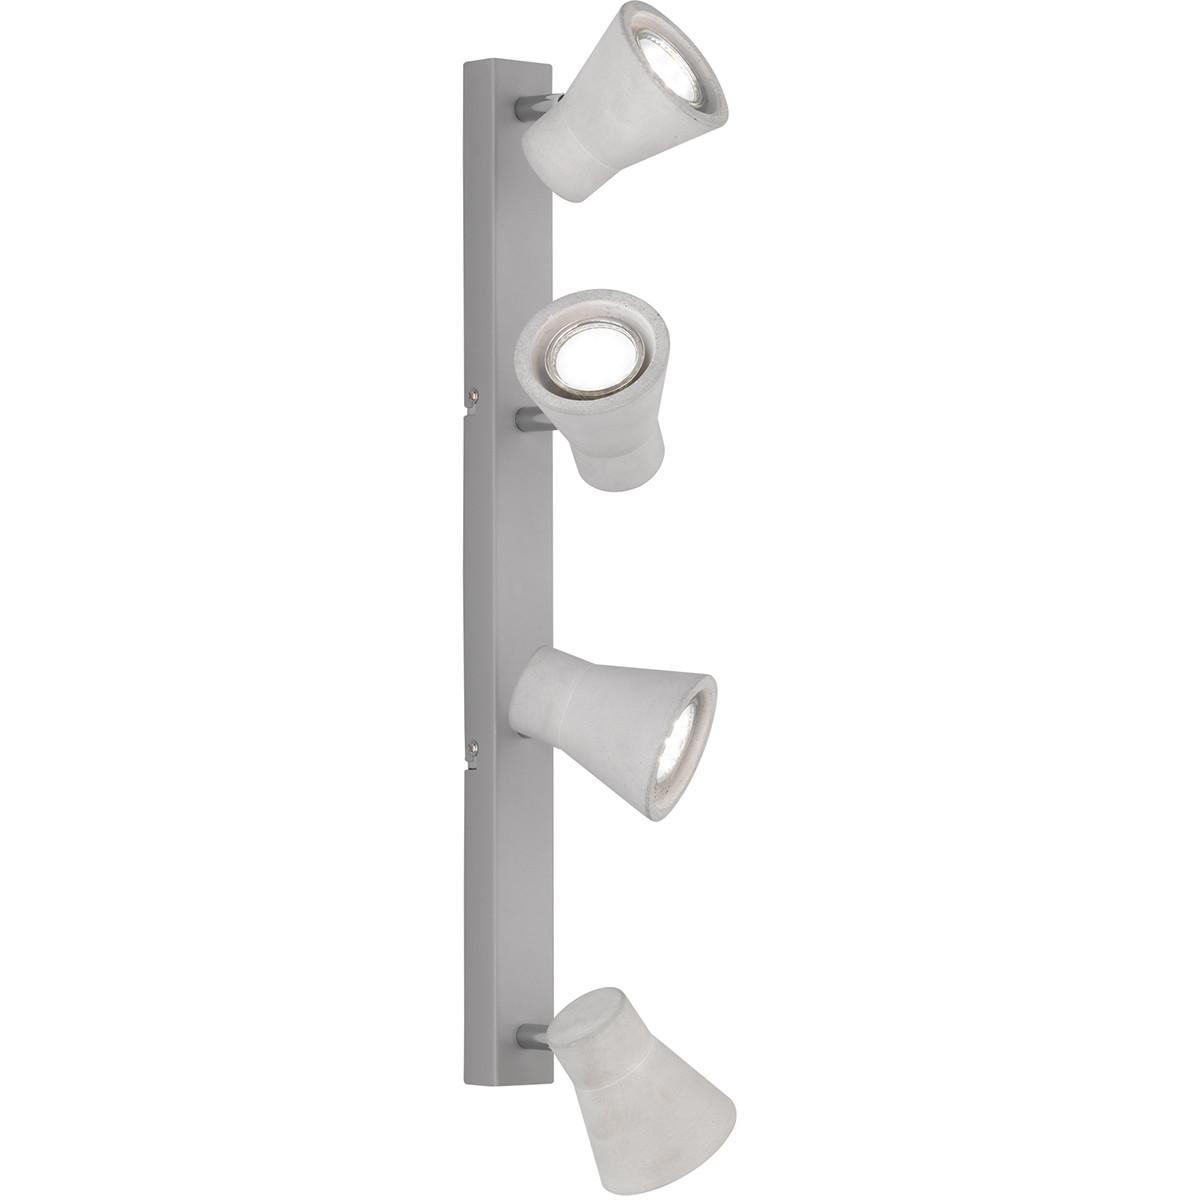 LED Plafondspot - Trion Antyna - GU10 Fitting - 12W - Warm Wit 3000K - 4-lichts - Rond - Beton Look